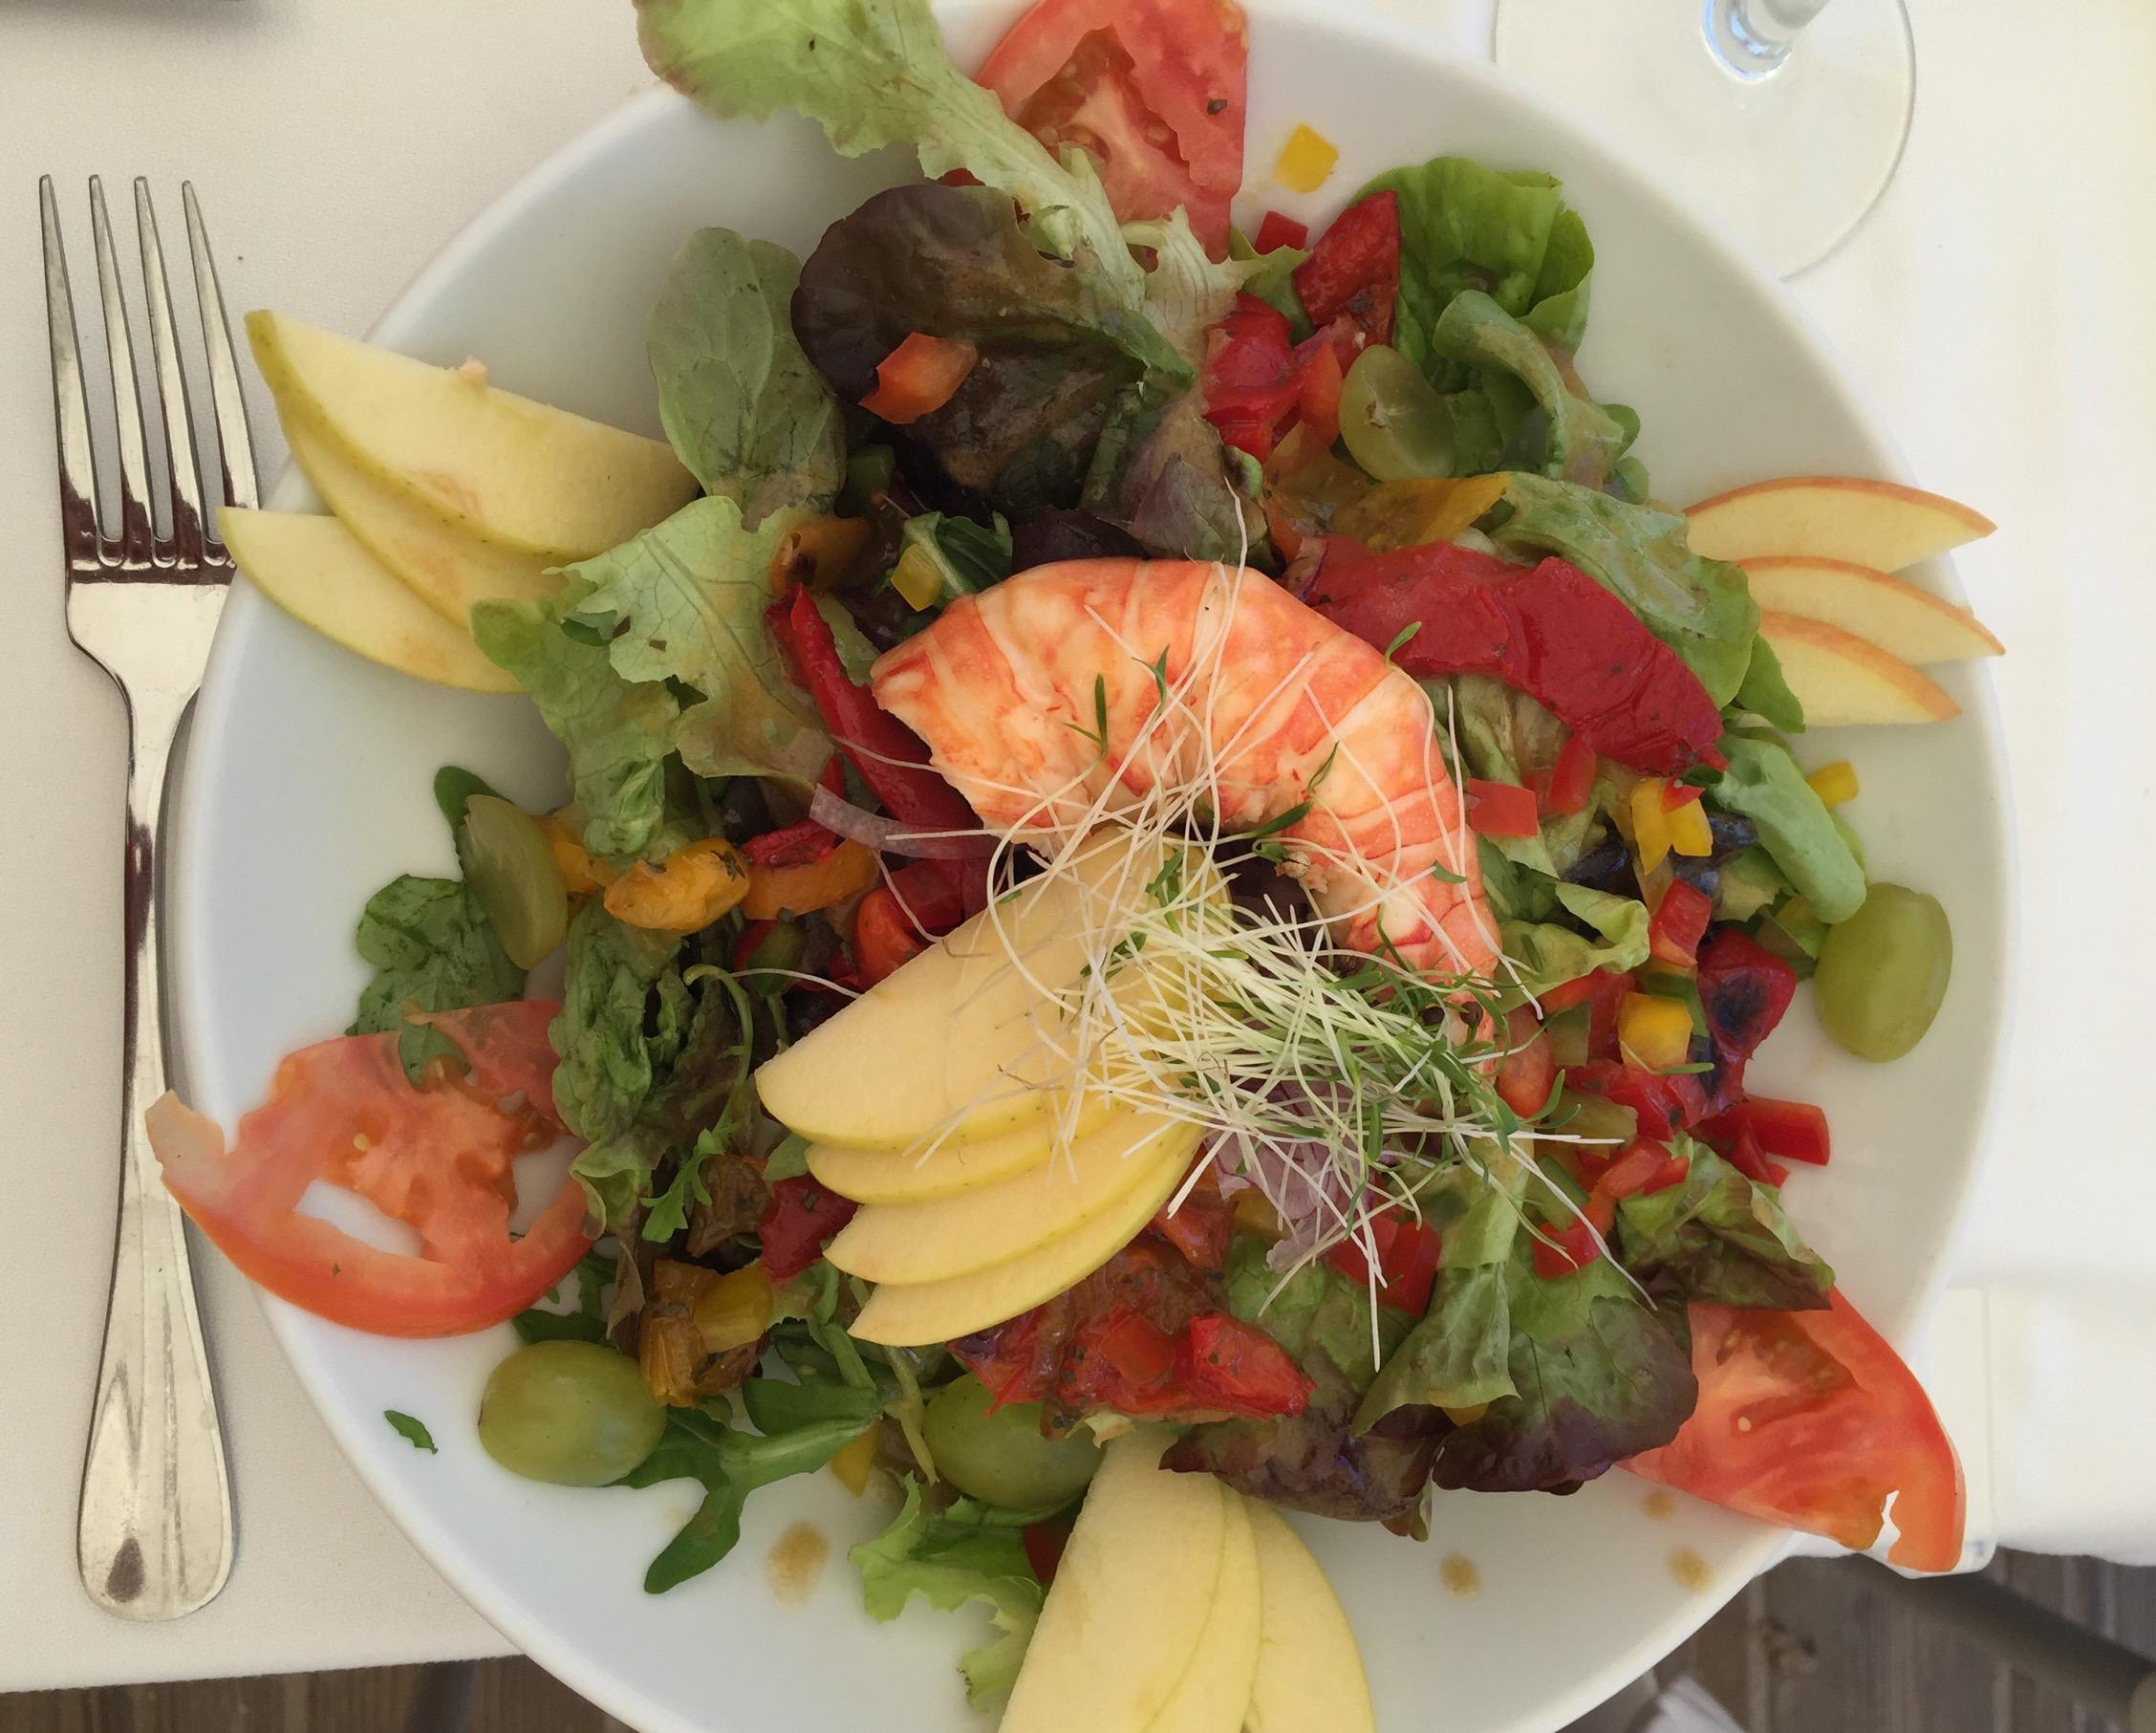 Lobster Salad at La Plage Tom Beach by Stephenie Rodriguez